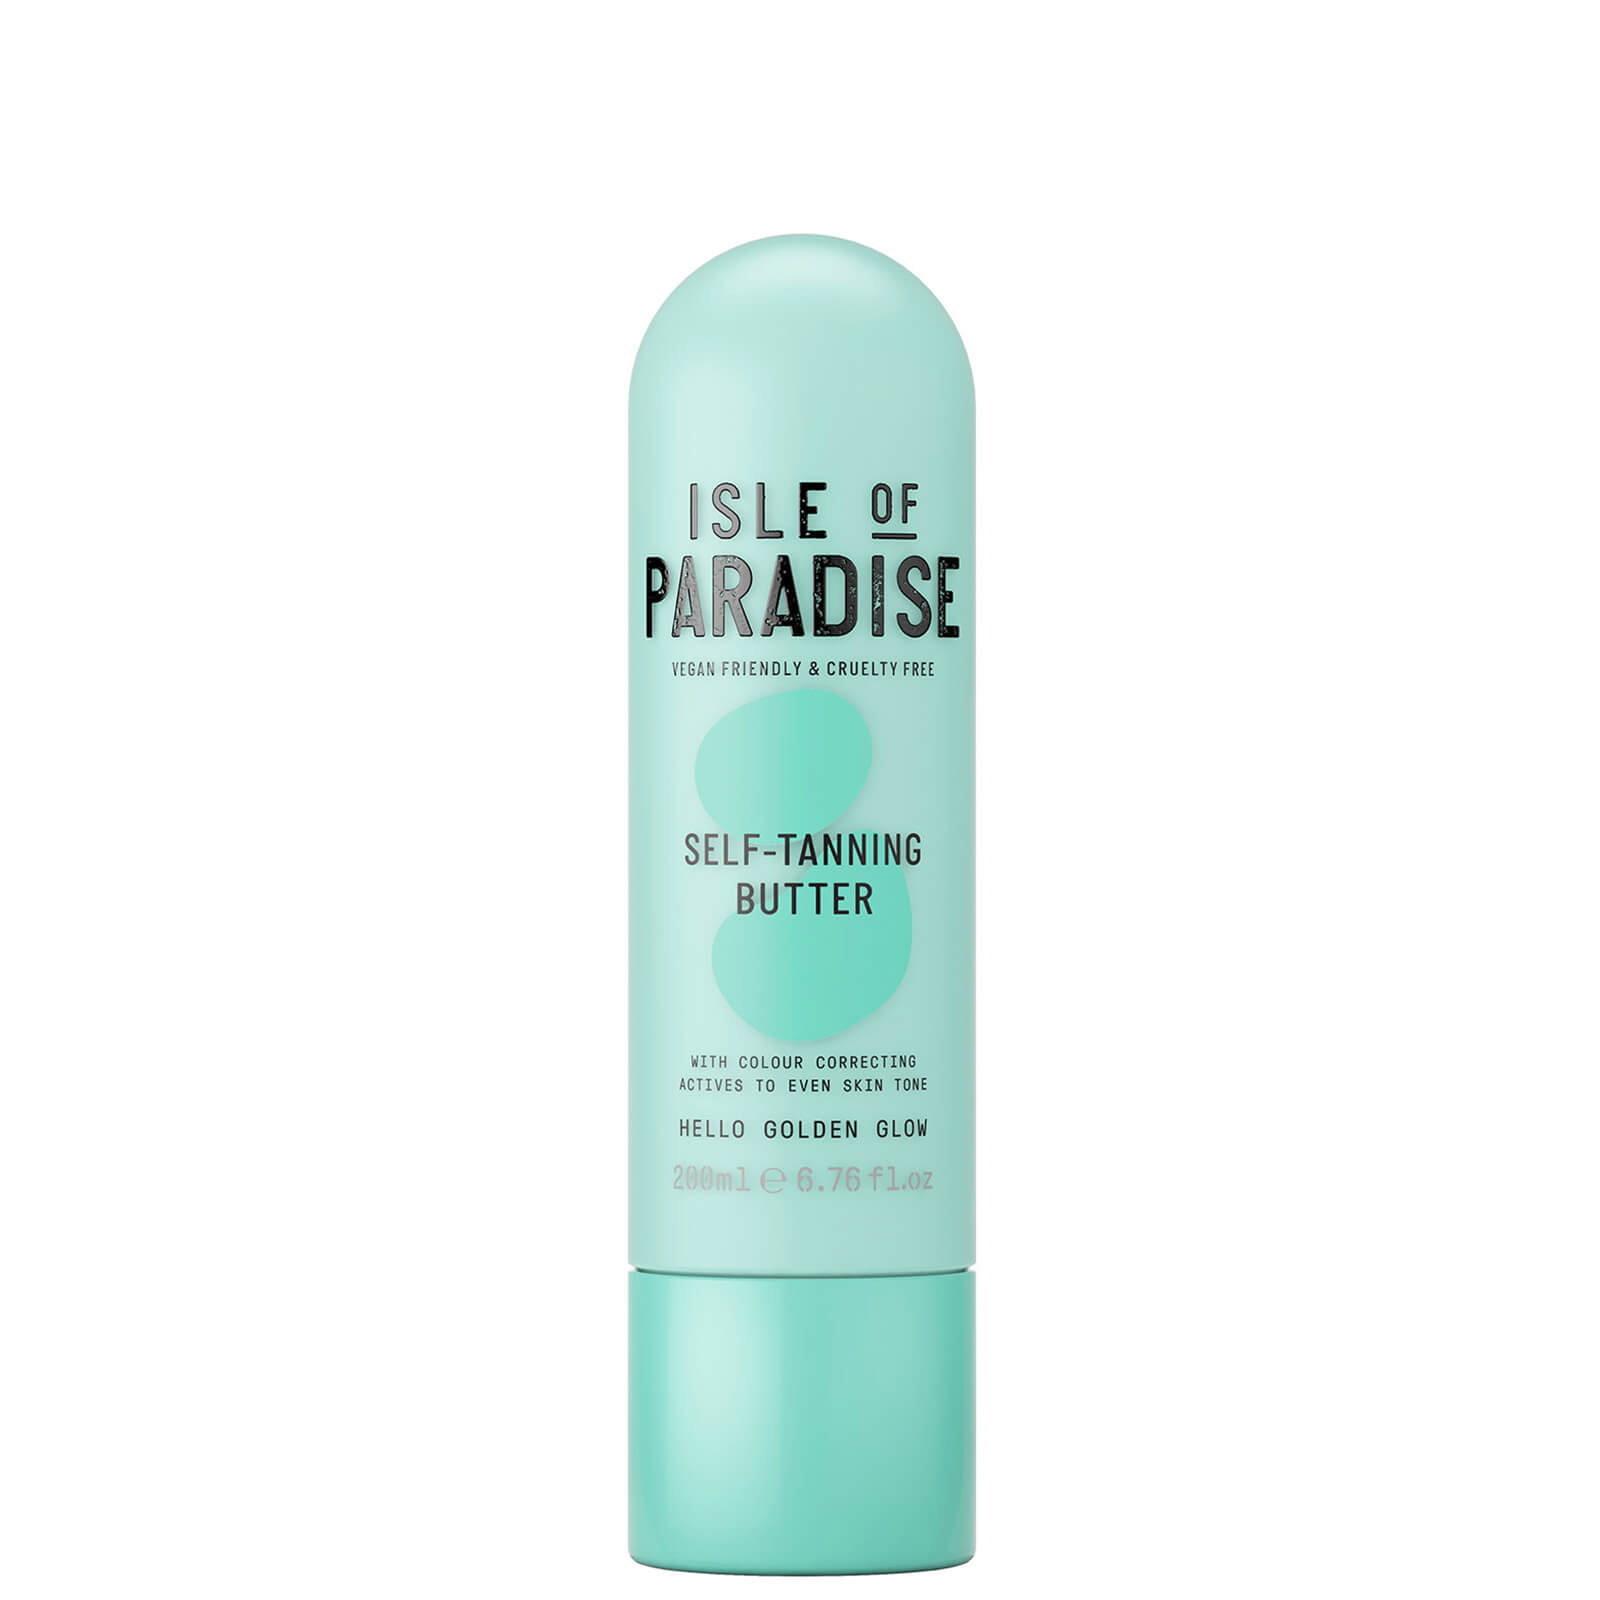 Купить Isle of Paradise Self Tanning Butter 200ml